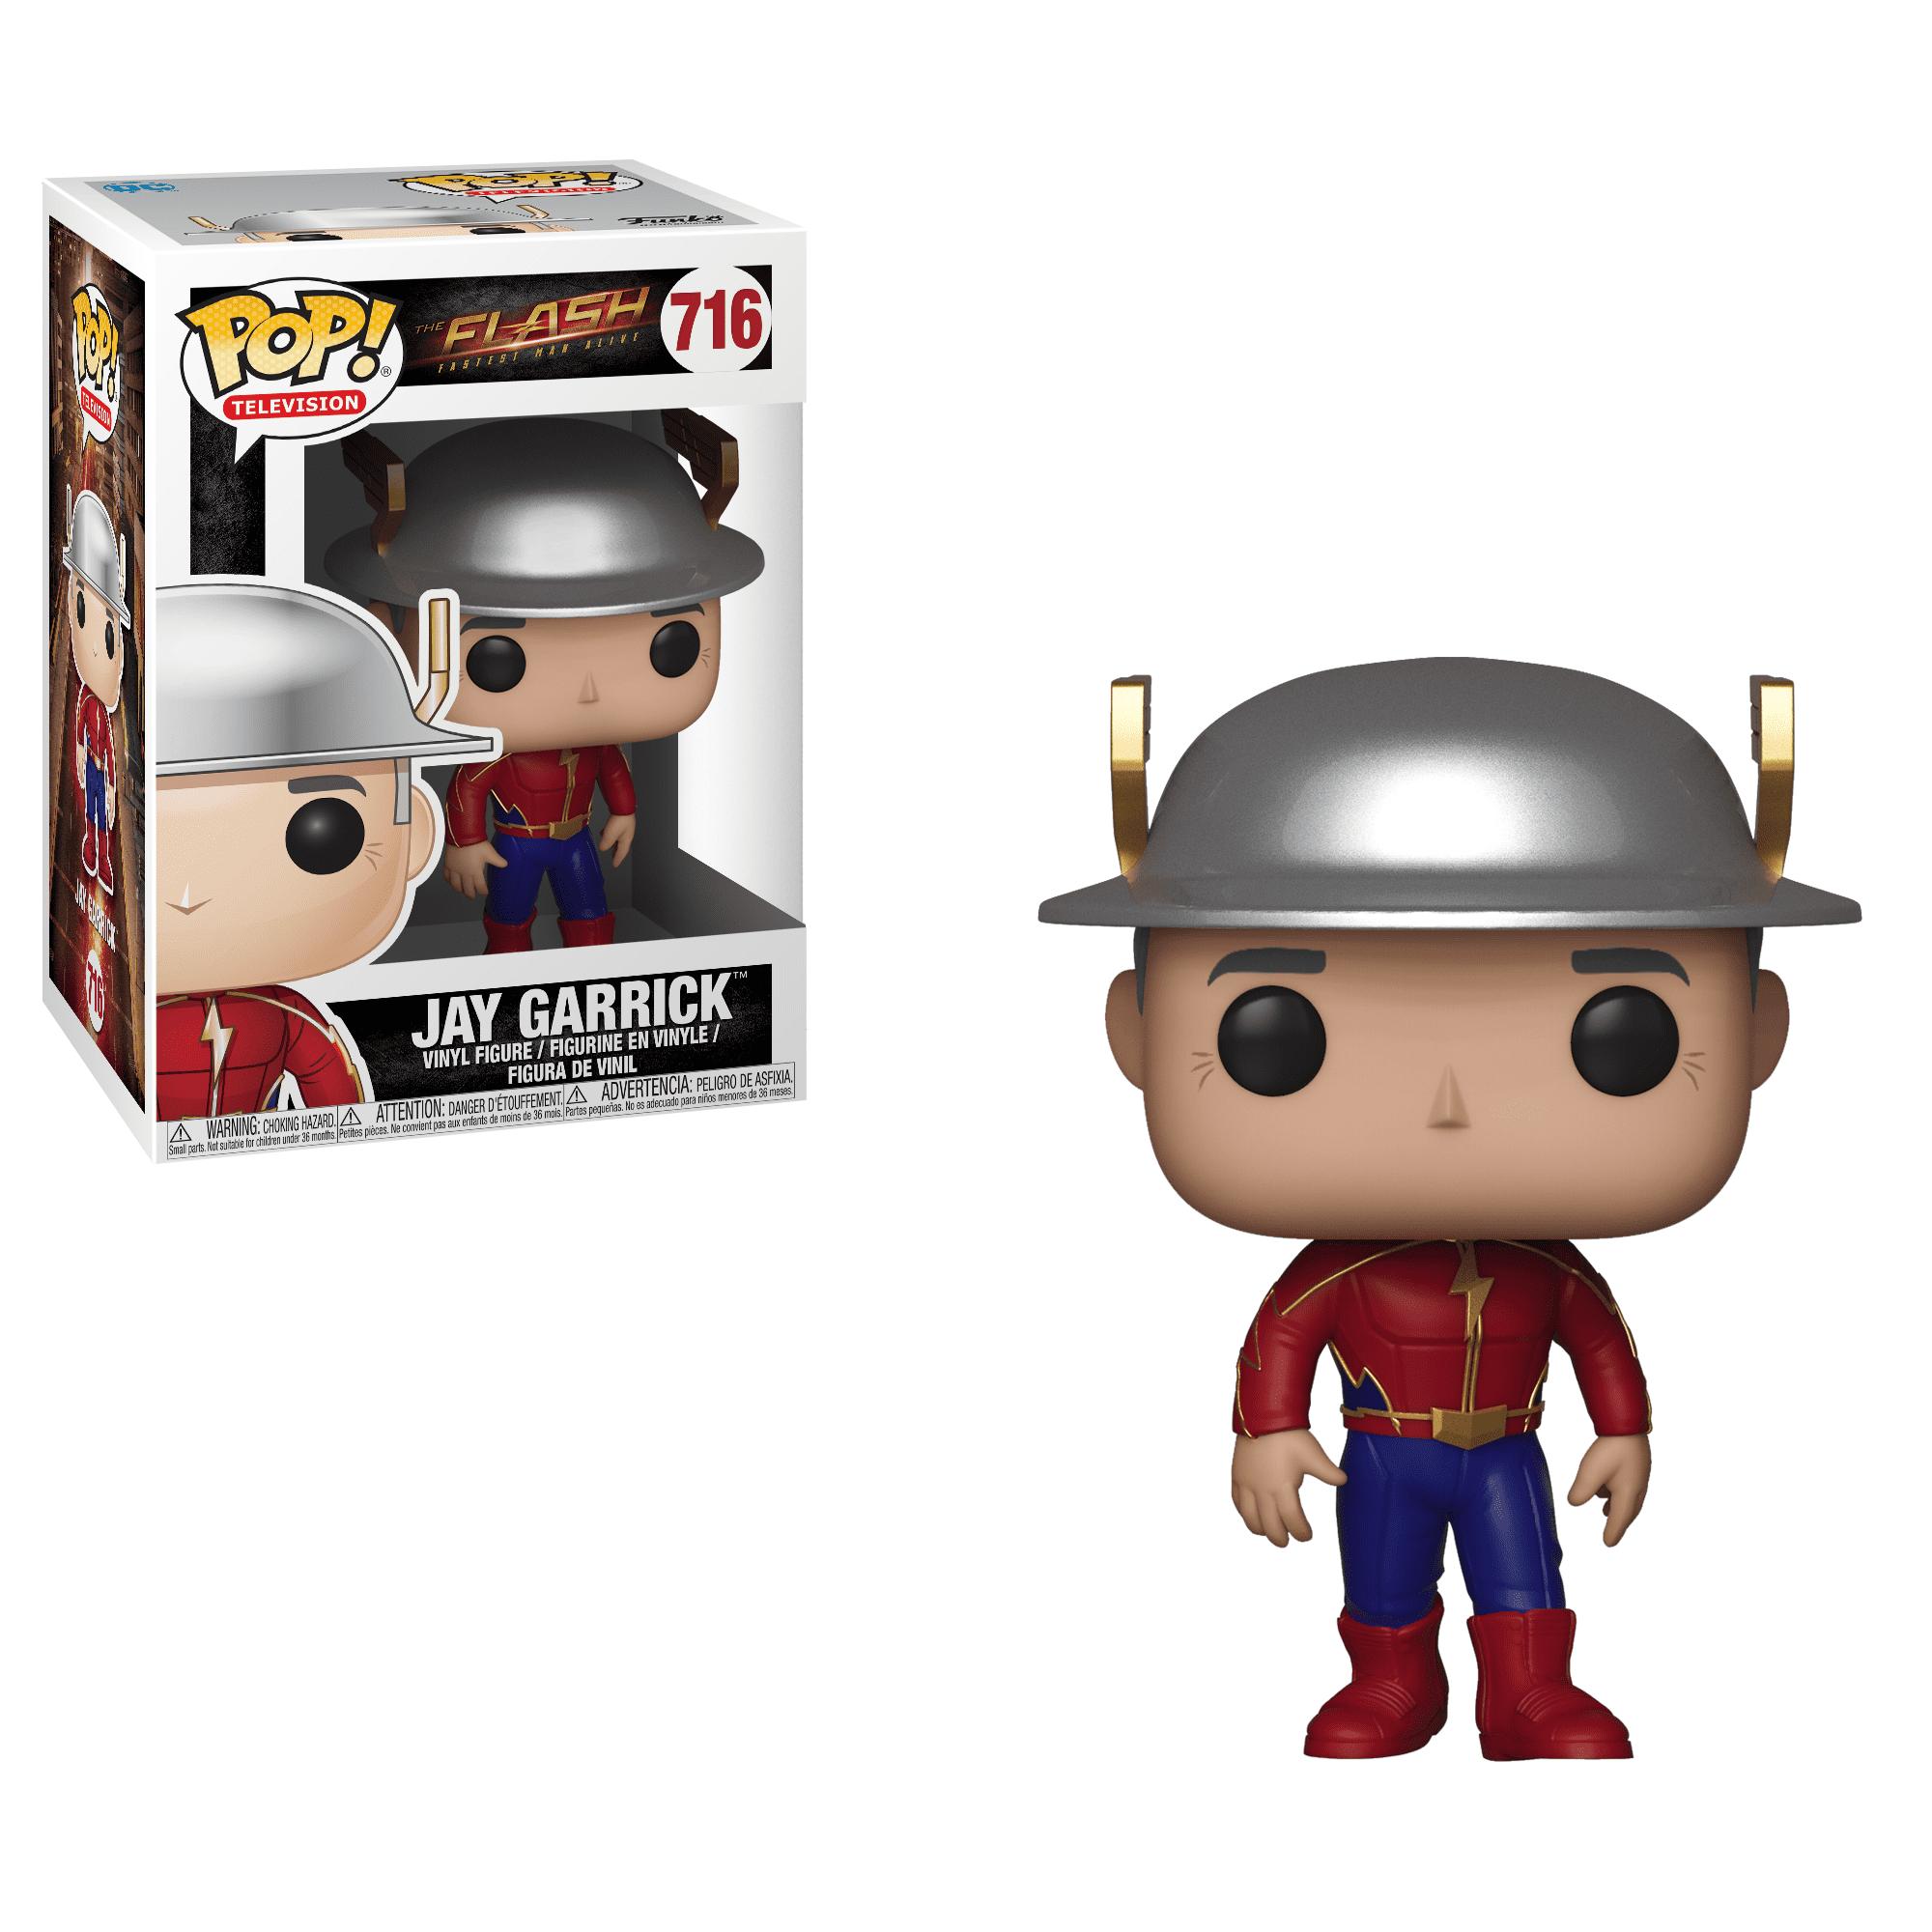 Funko Pop! TV: The Flash - Jay Garrick